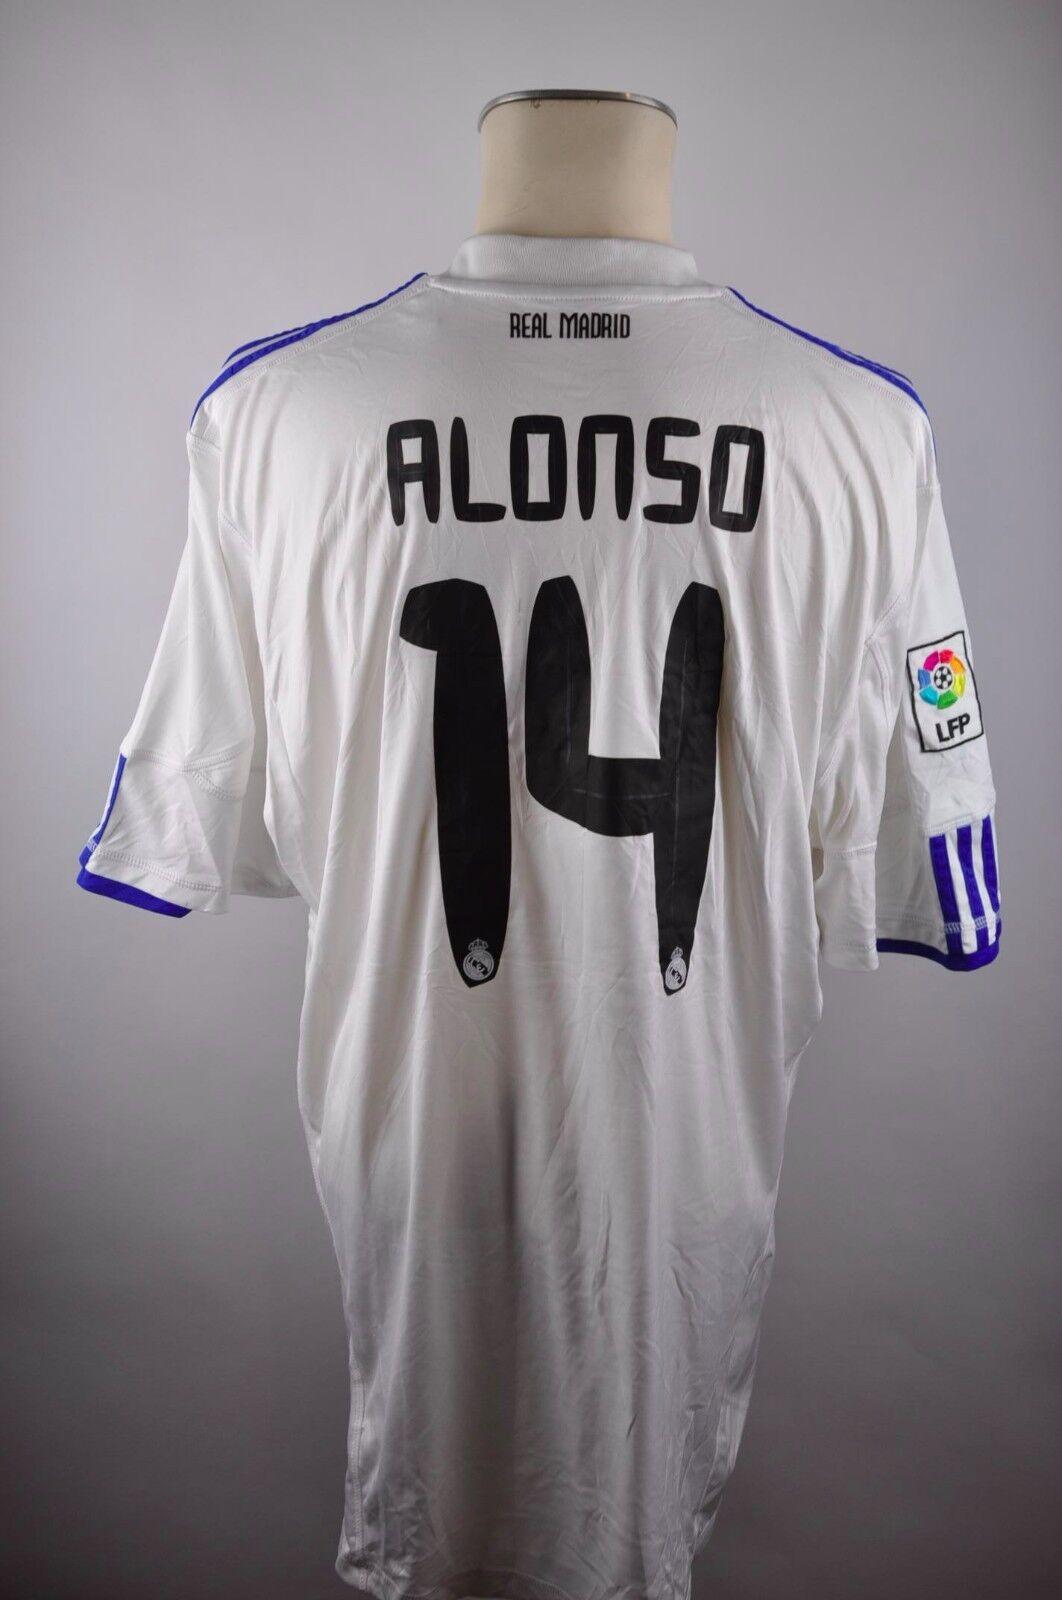 Real Madrid Trikot 2010-11 Gr. XXL Alonso Adidas Spanien bwin Shirt